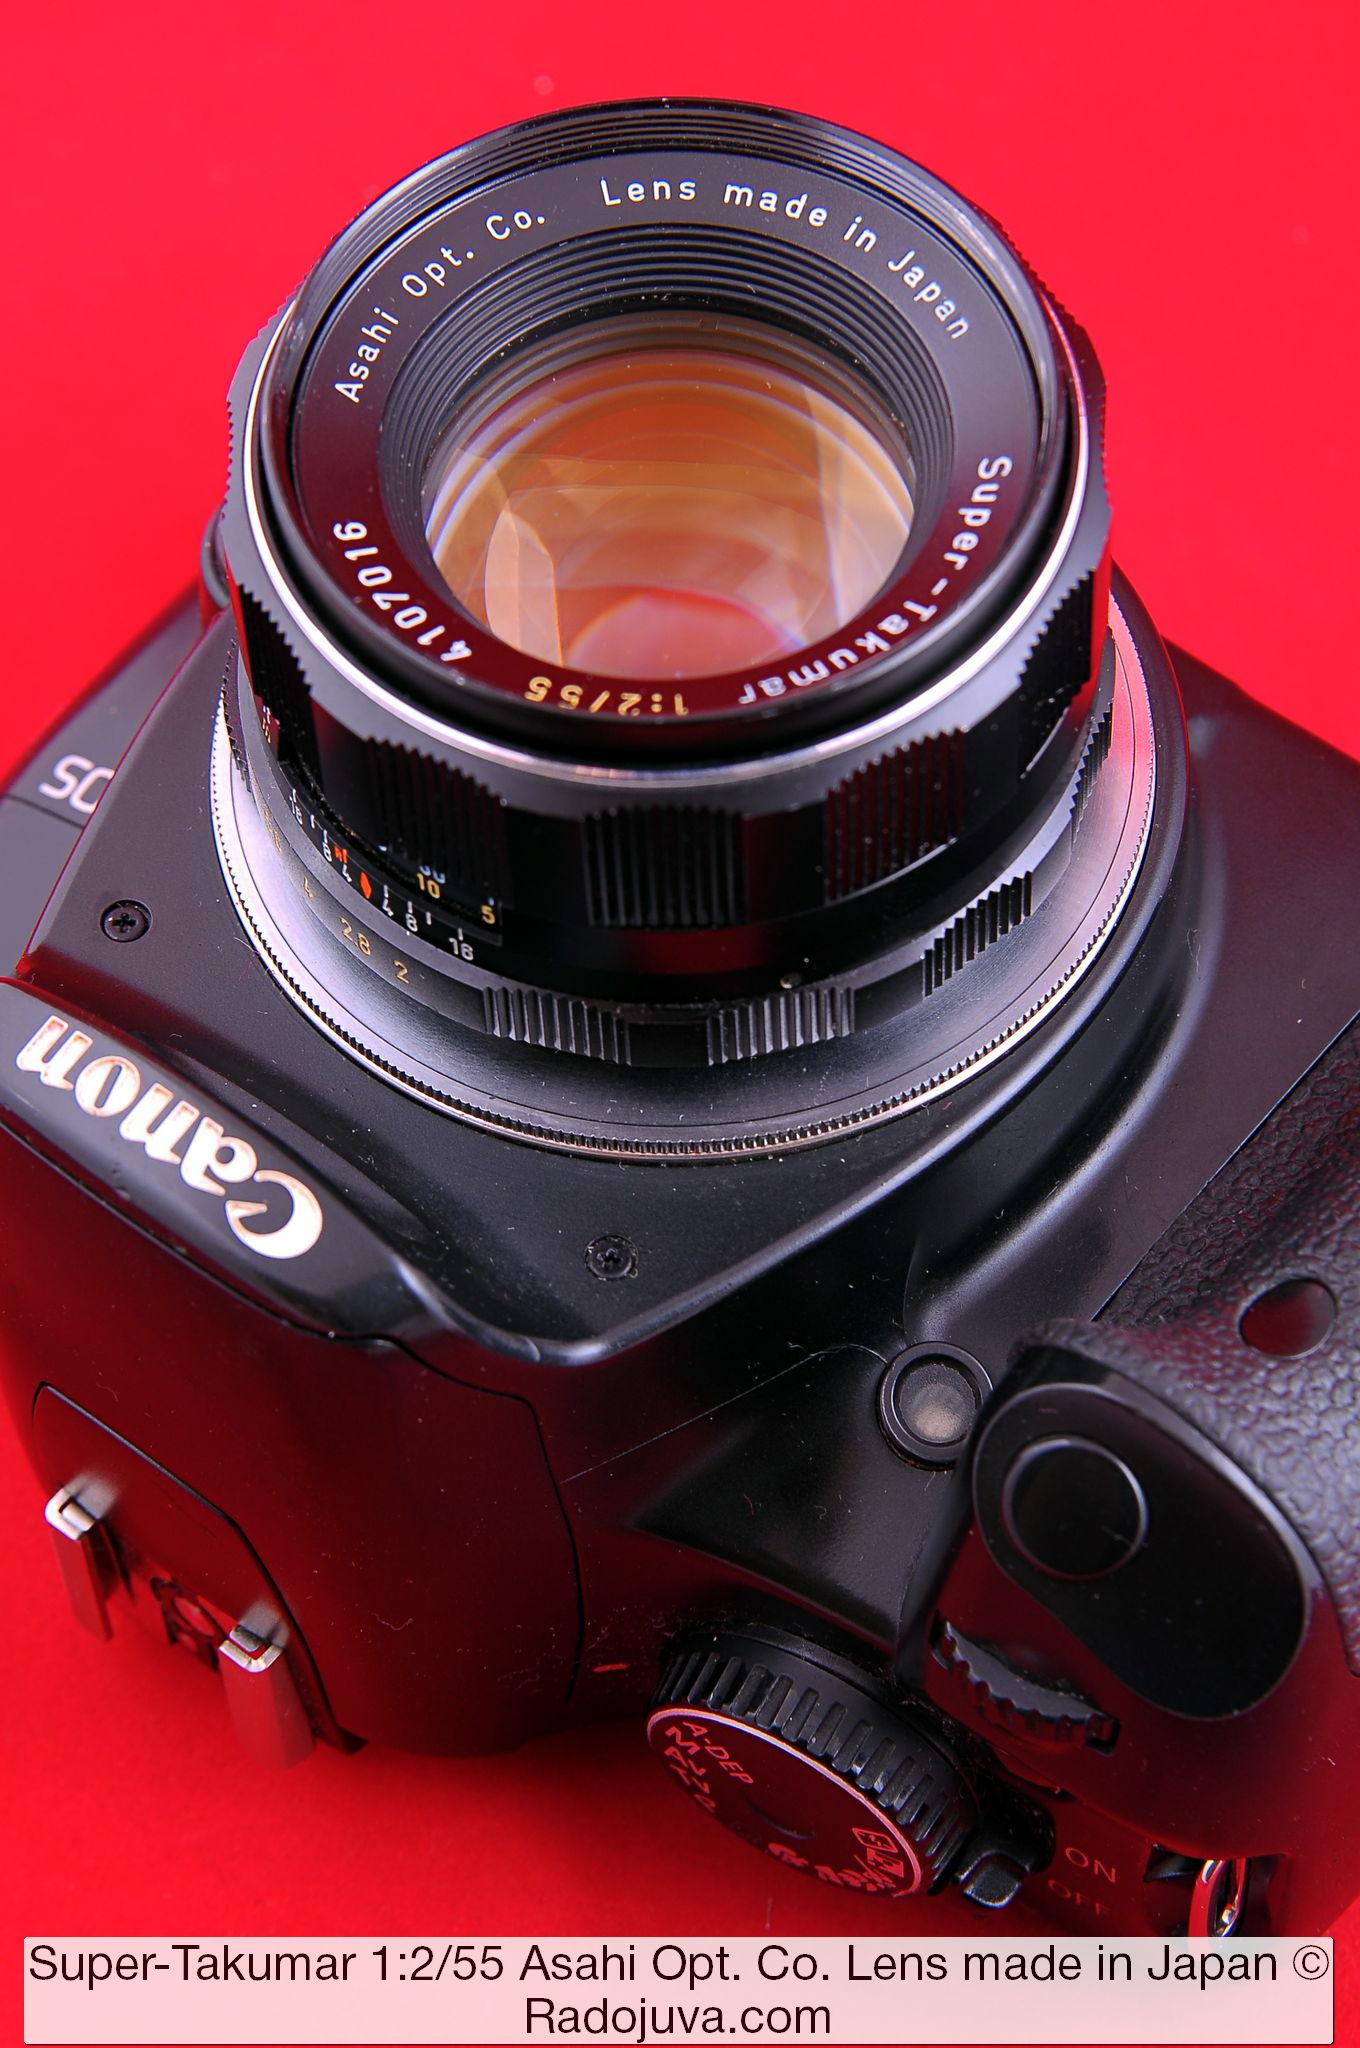 Объектив Super-Takumar 1:2/55 Asahi Opt. Co. Lens made in Japan. Объектив показан на цифровом зеркальном фотоаппарате Canon EOS DIGITAL Rebel XSi. Установка объектива на фотоаппарат осуществлена с помощью переходника M42-Canon EOS с чипом.